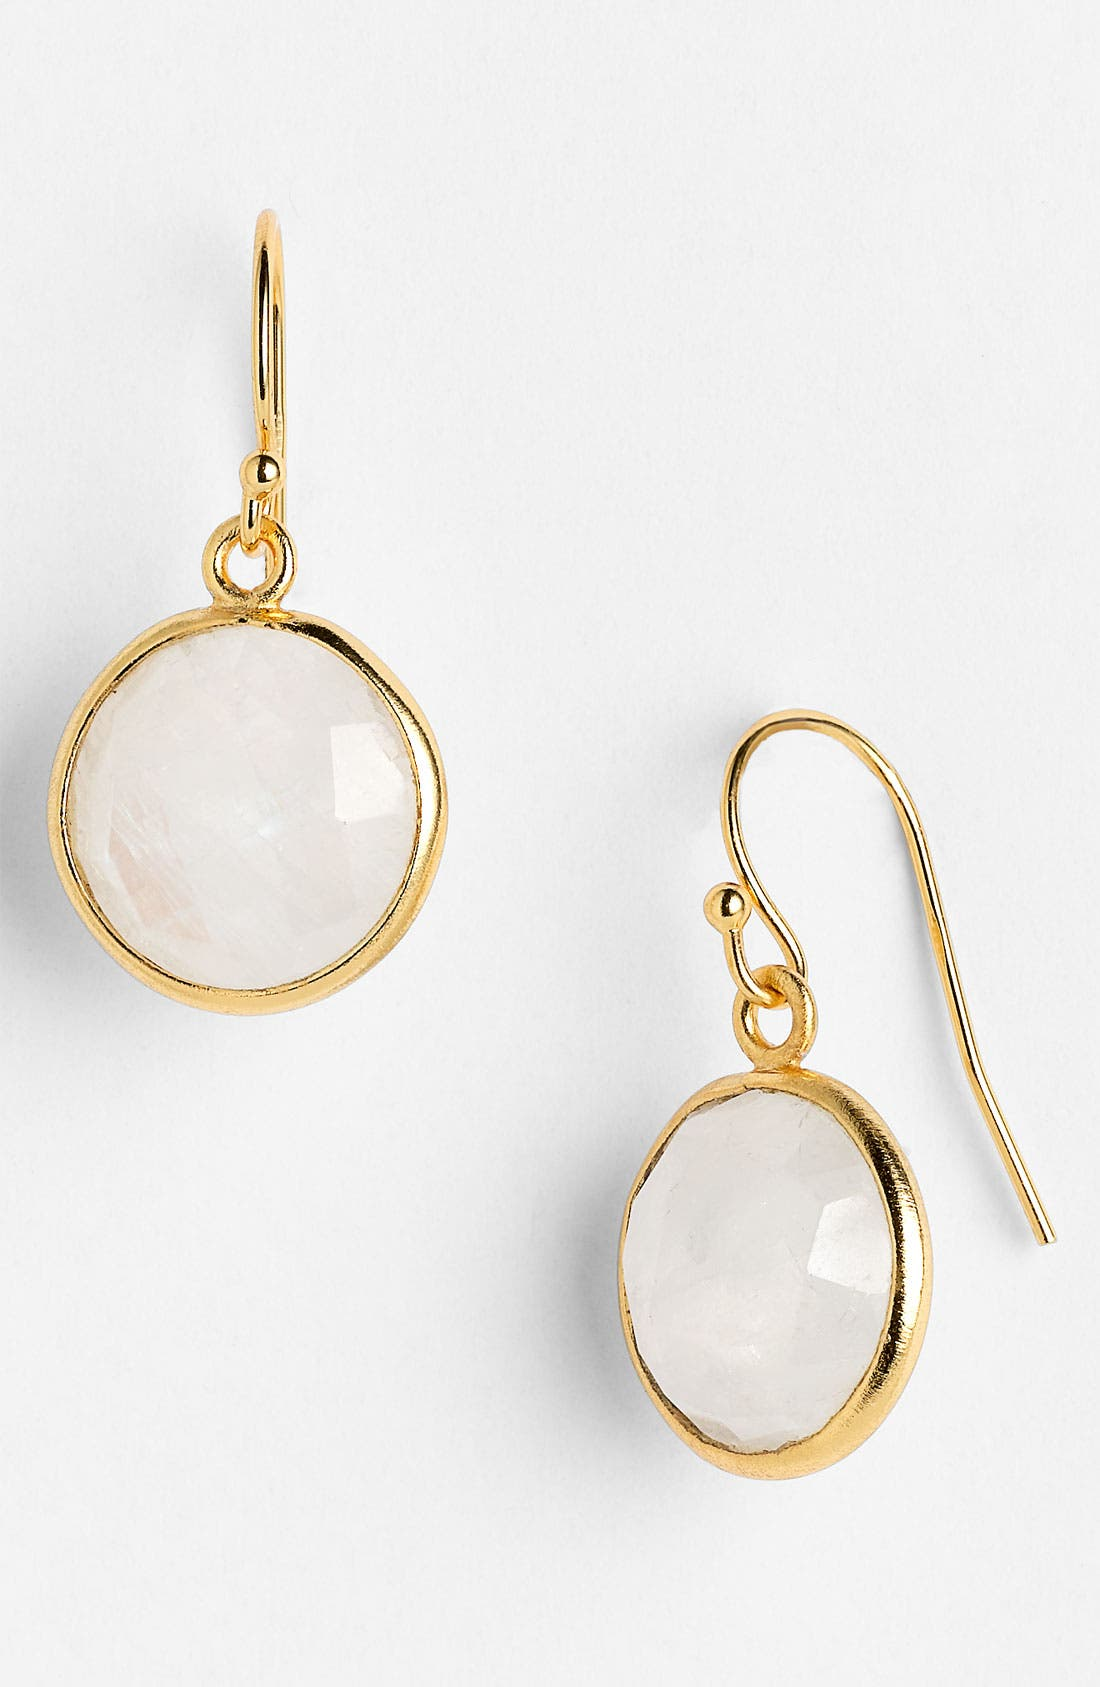 Main Image - NuNu Designs Round Semiprecious Drop Earrings